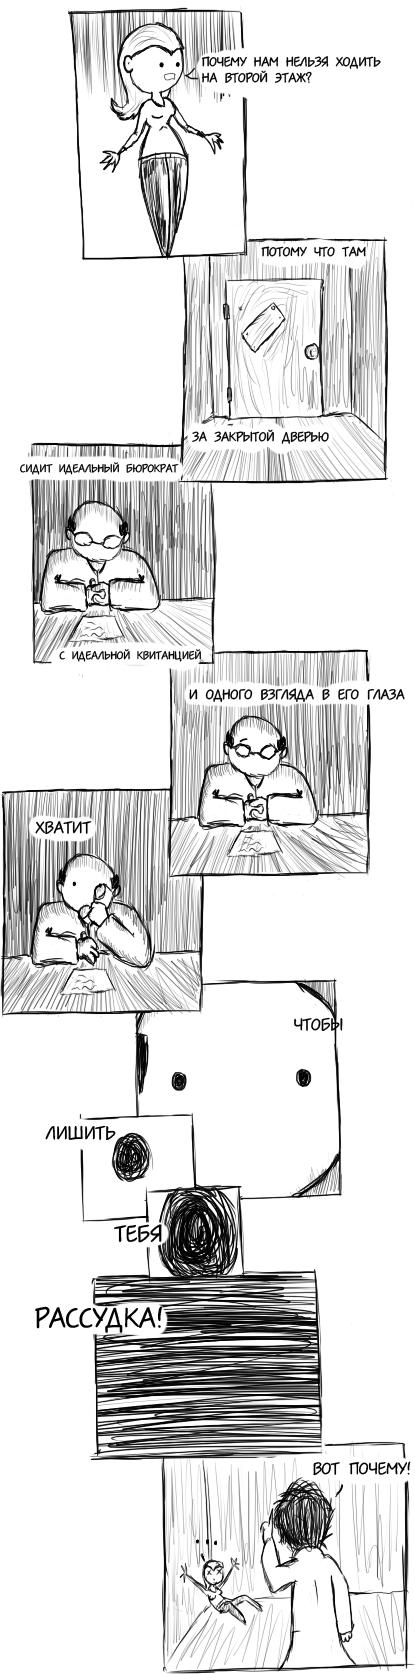 Комикс битва №16 выпуск 111